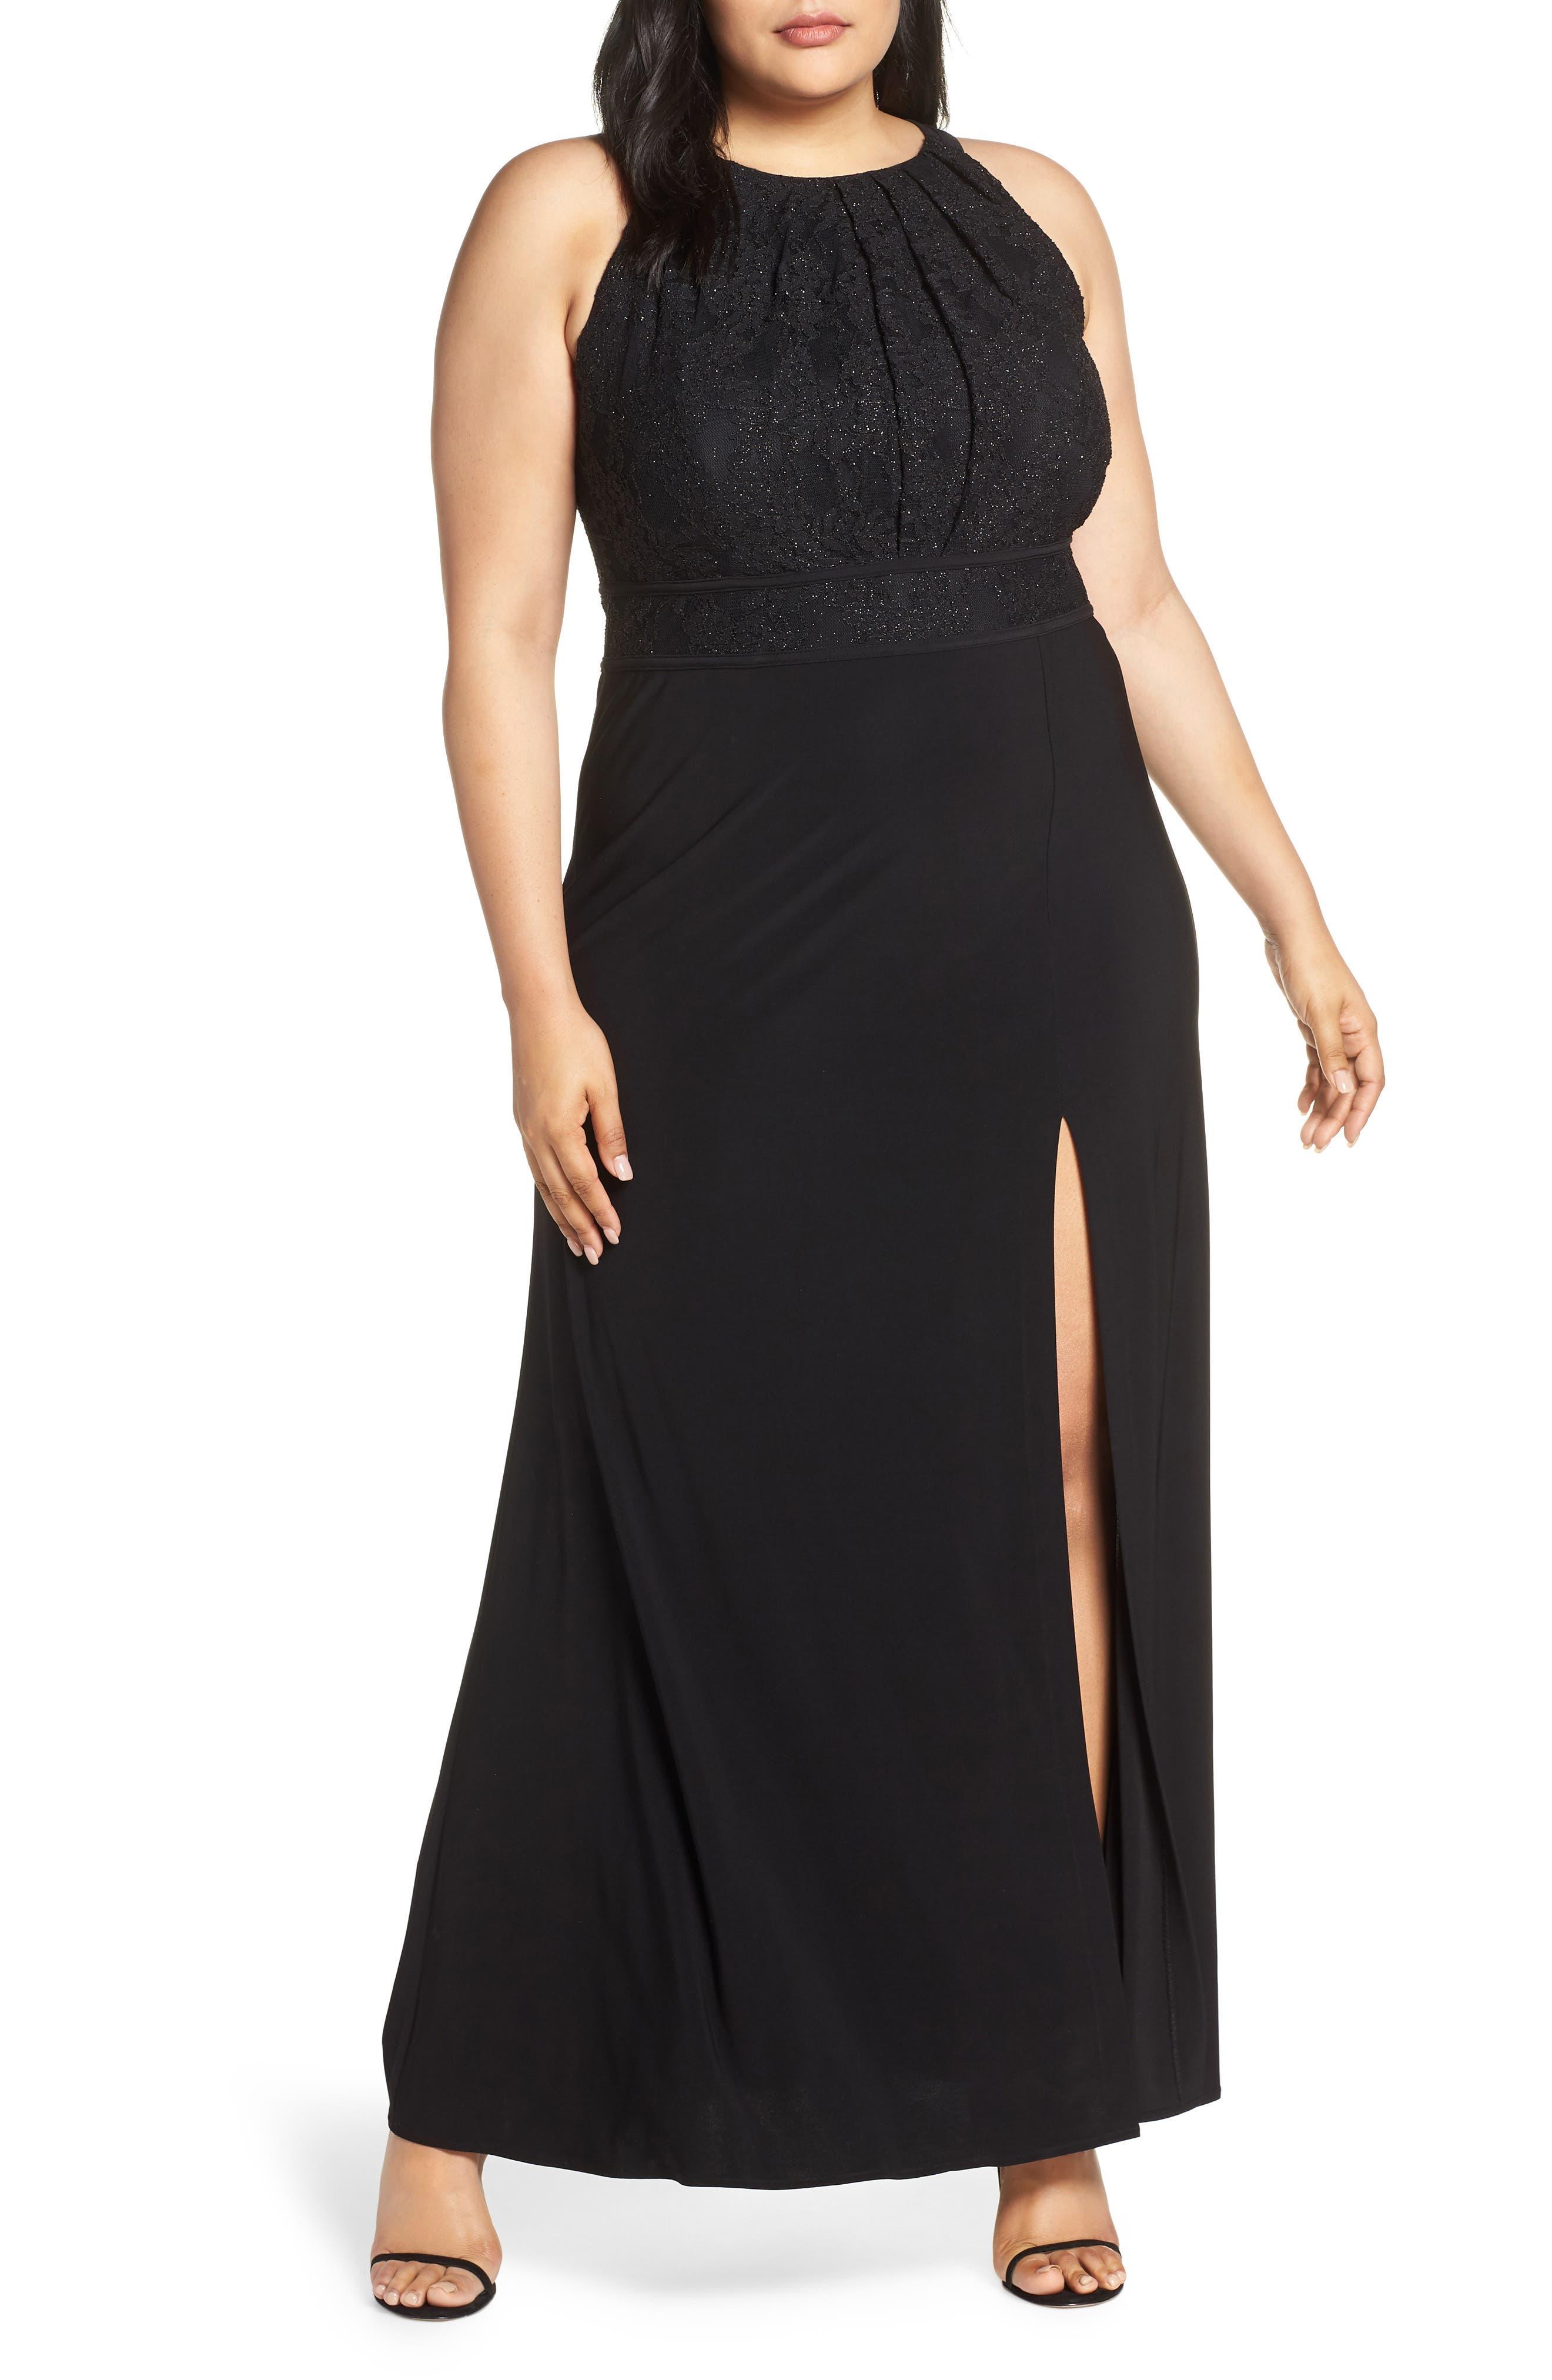 Plus Size Morgan And Co. Pleat Lace Bodice Evening Dress, Black